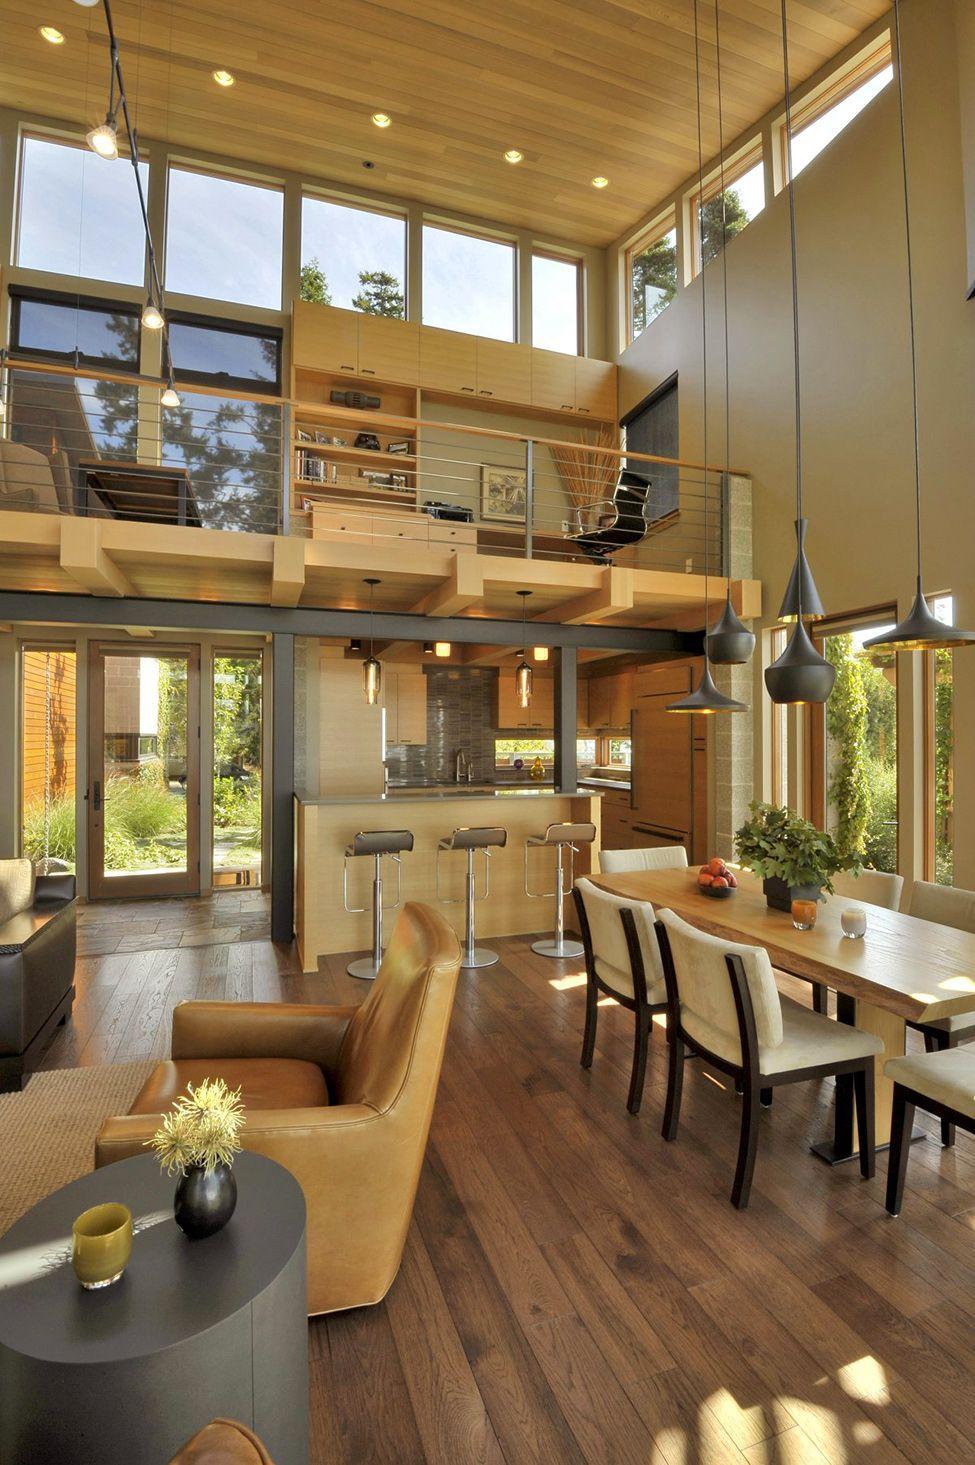 House Wooden Interior1jpg 9751465 futurs casa